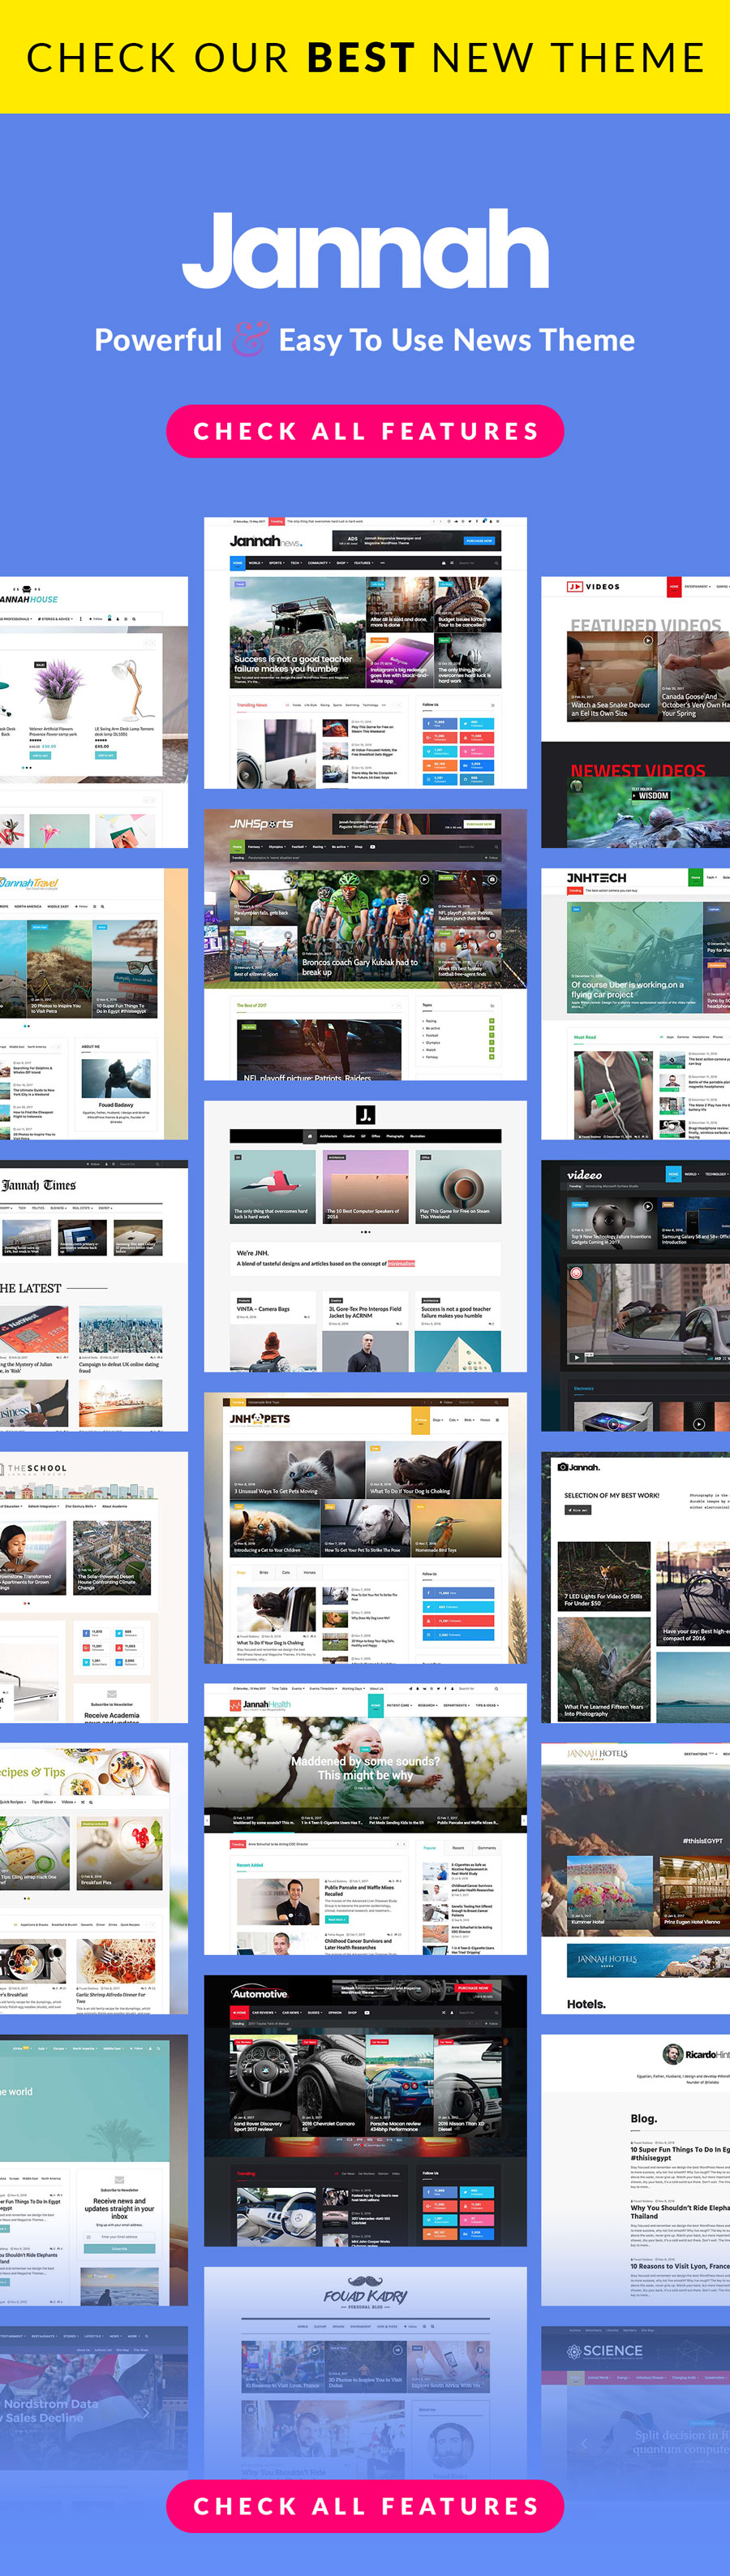 jannah ret themes - Jarida - Responsive WordPress News, Magazine, Blog